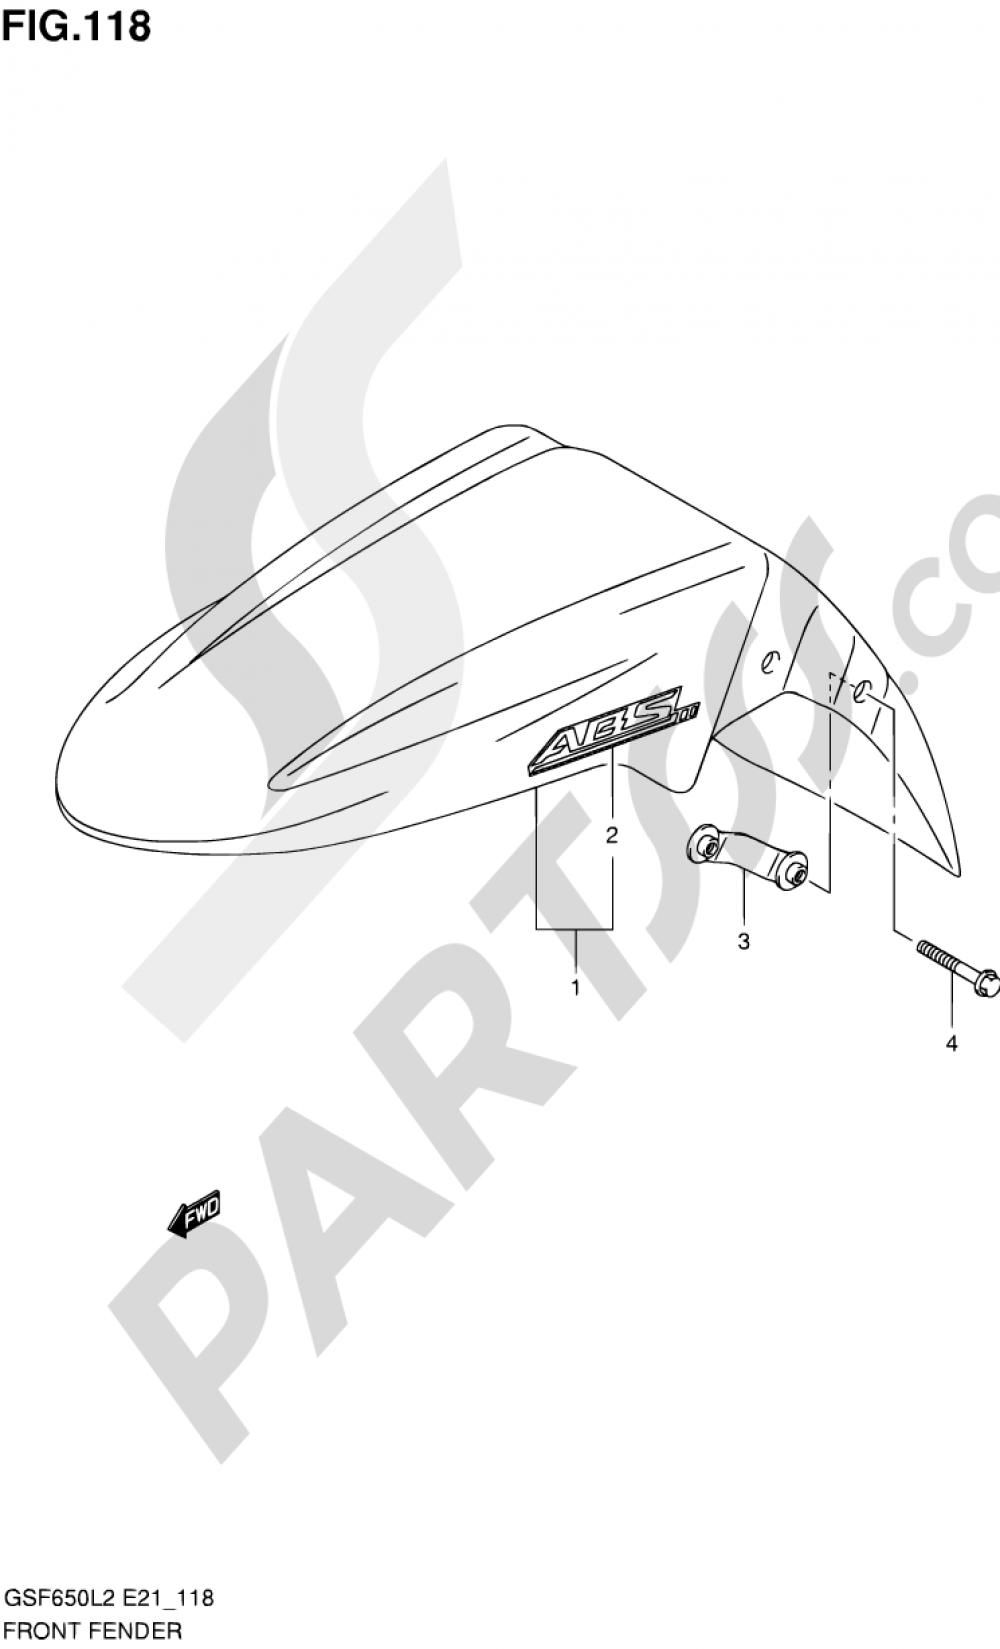 118 - FRONT FENDER (GSF650SUAL2 E21) Suzuki BANDIT GSF650 2012